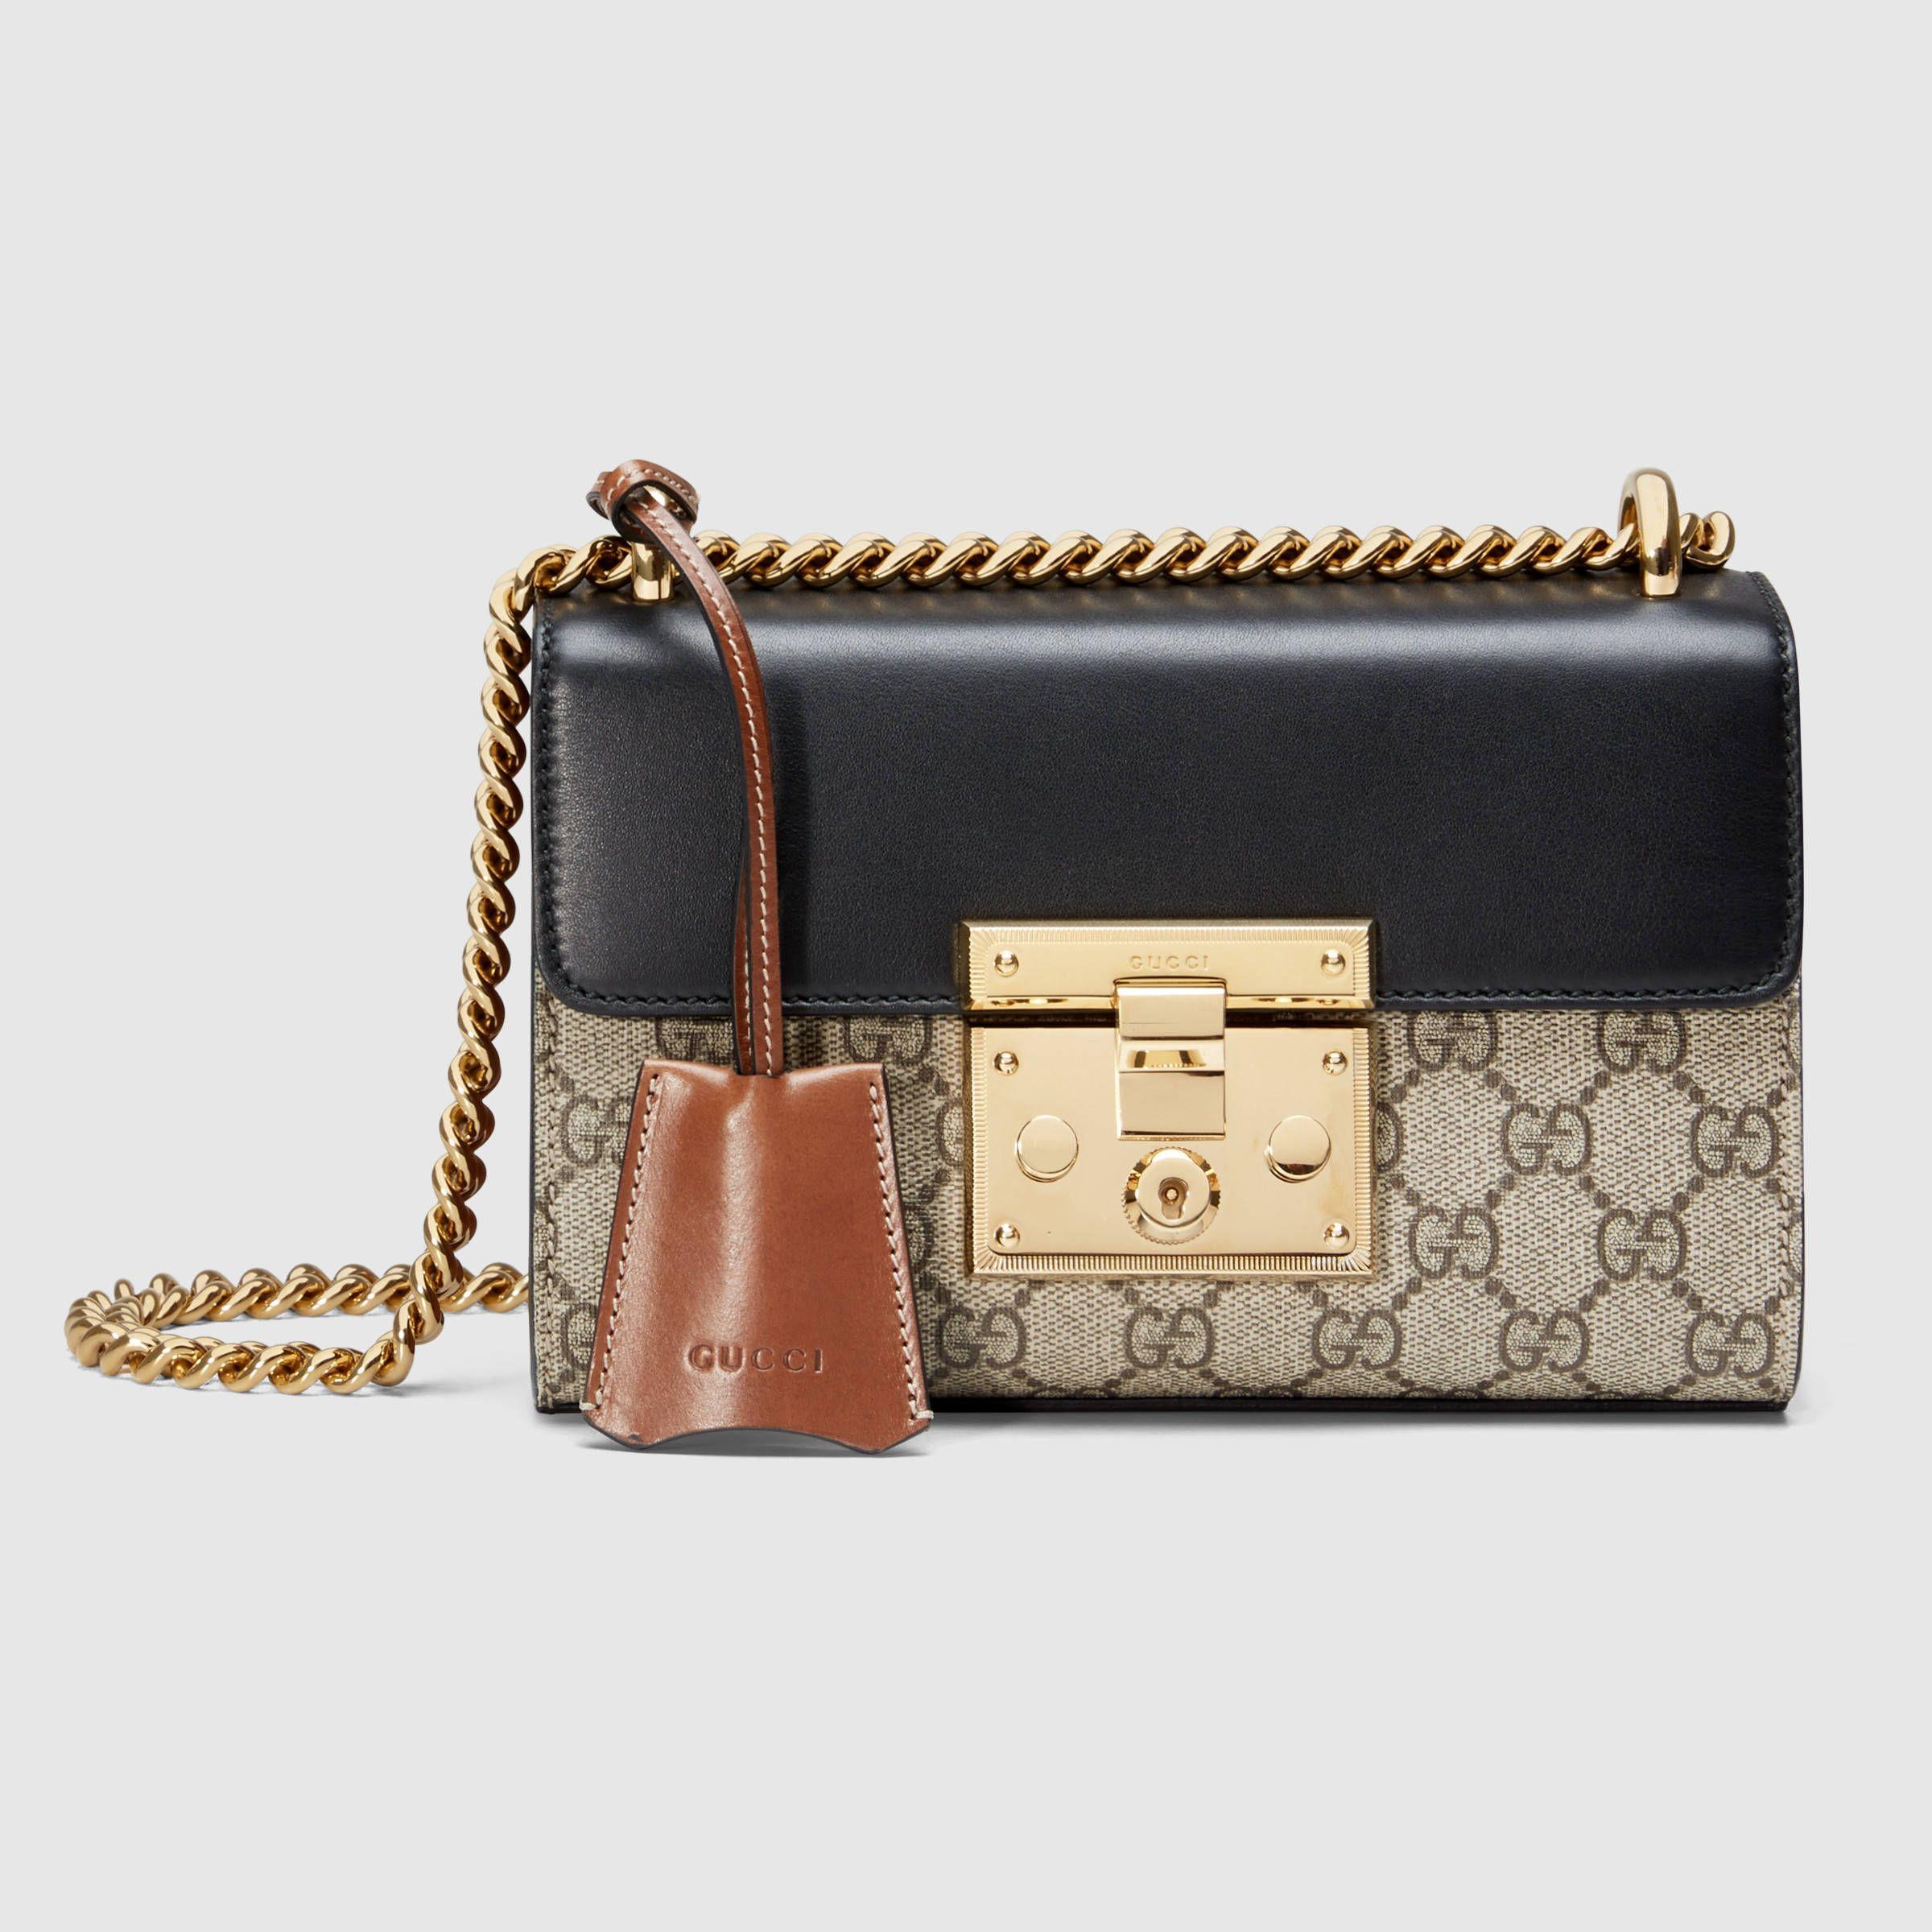 797f23693c9 Gucci Women - Padlock GG Supreme shoulder bag - 409487KLQJG9785